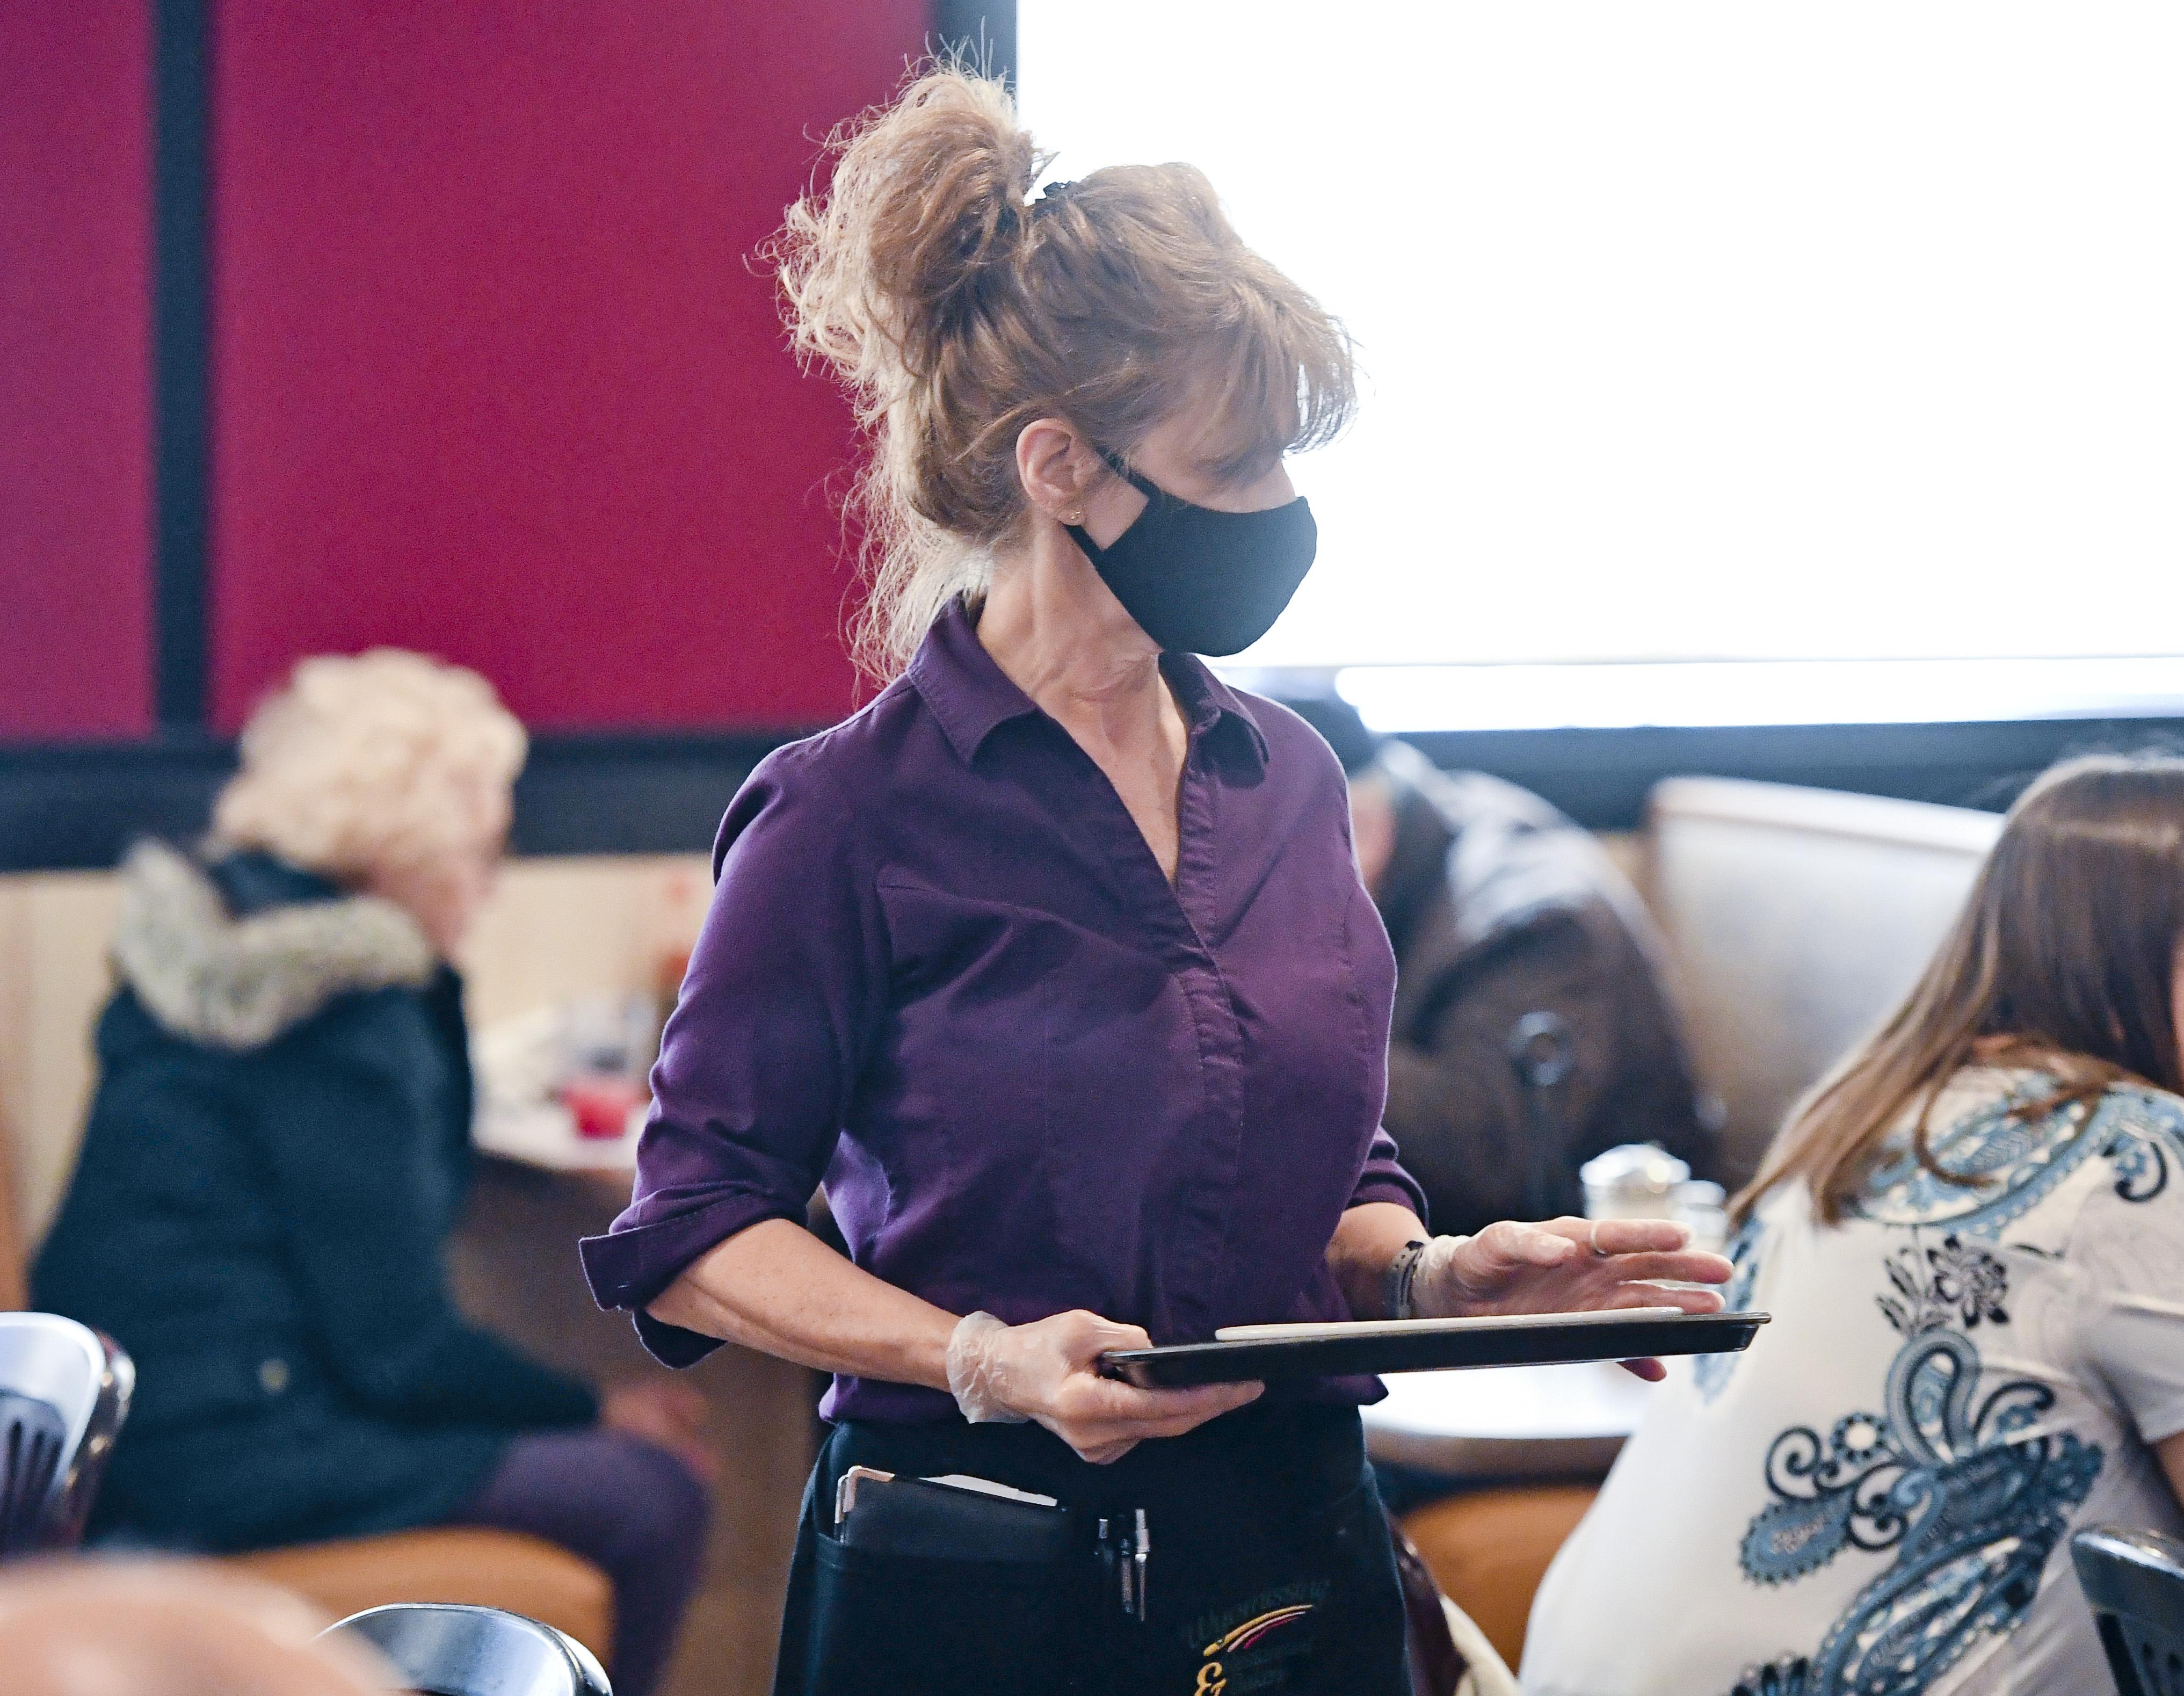 Restaurant server wearing a mask taking orders inside.